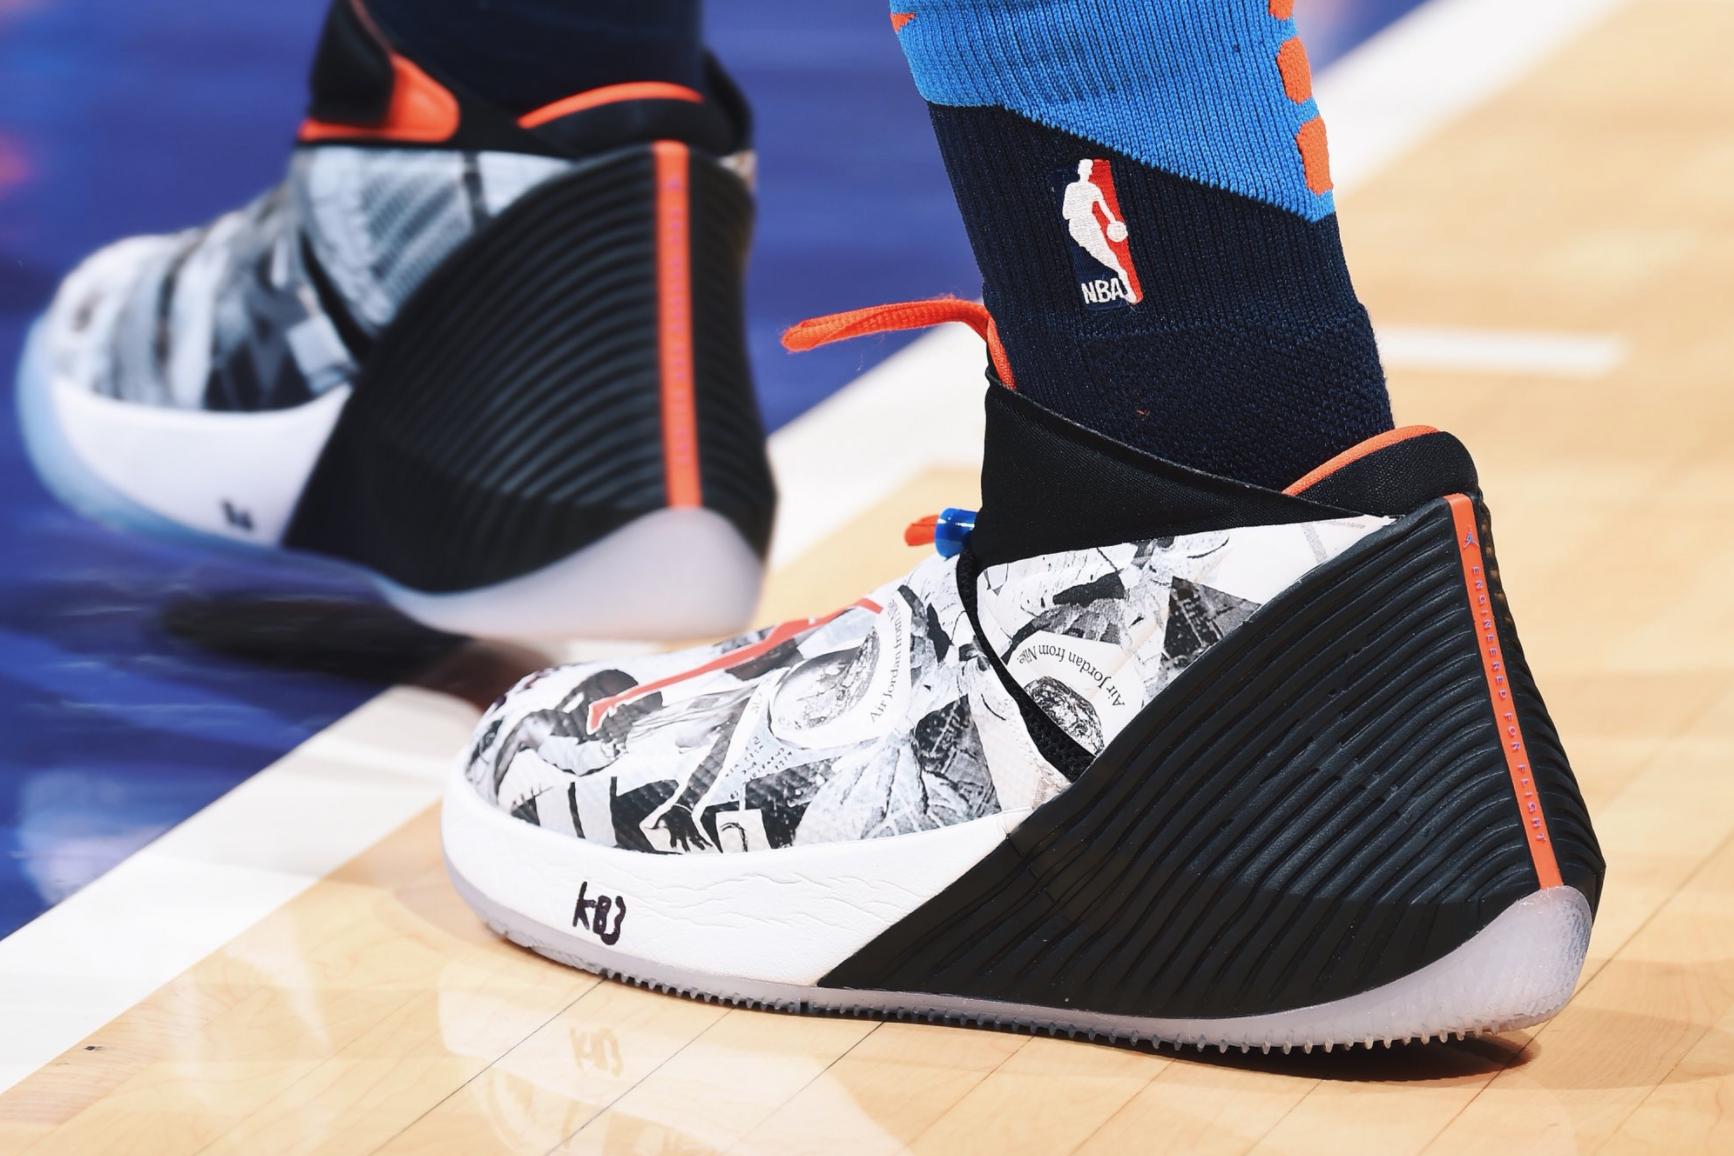 Air Jordan Why Not Zer0.1 Shoes